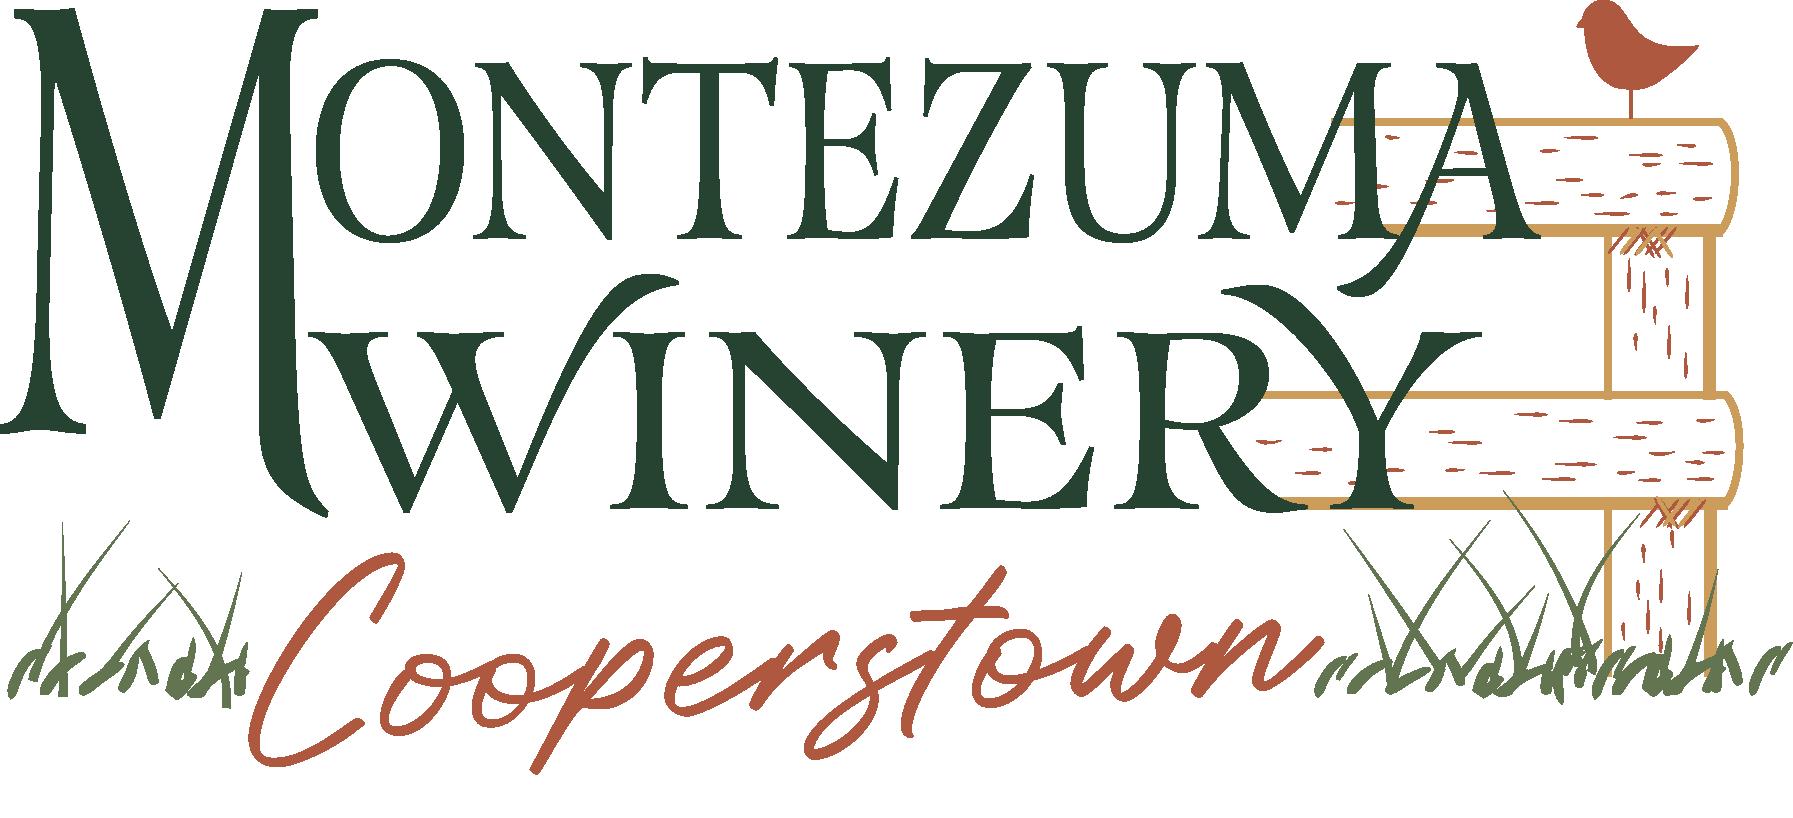 Montezuma Winery Cooperstown